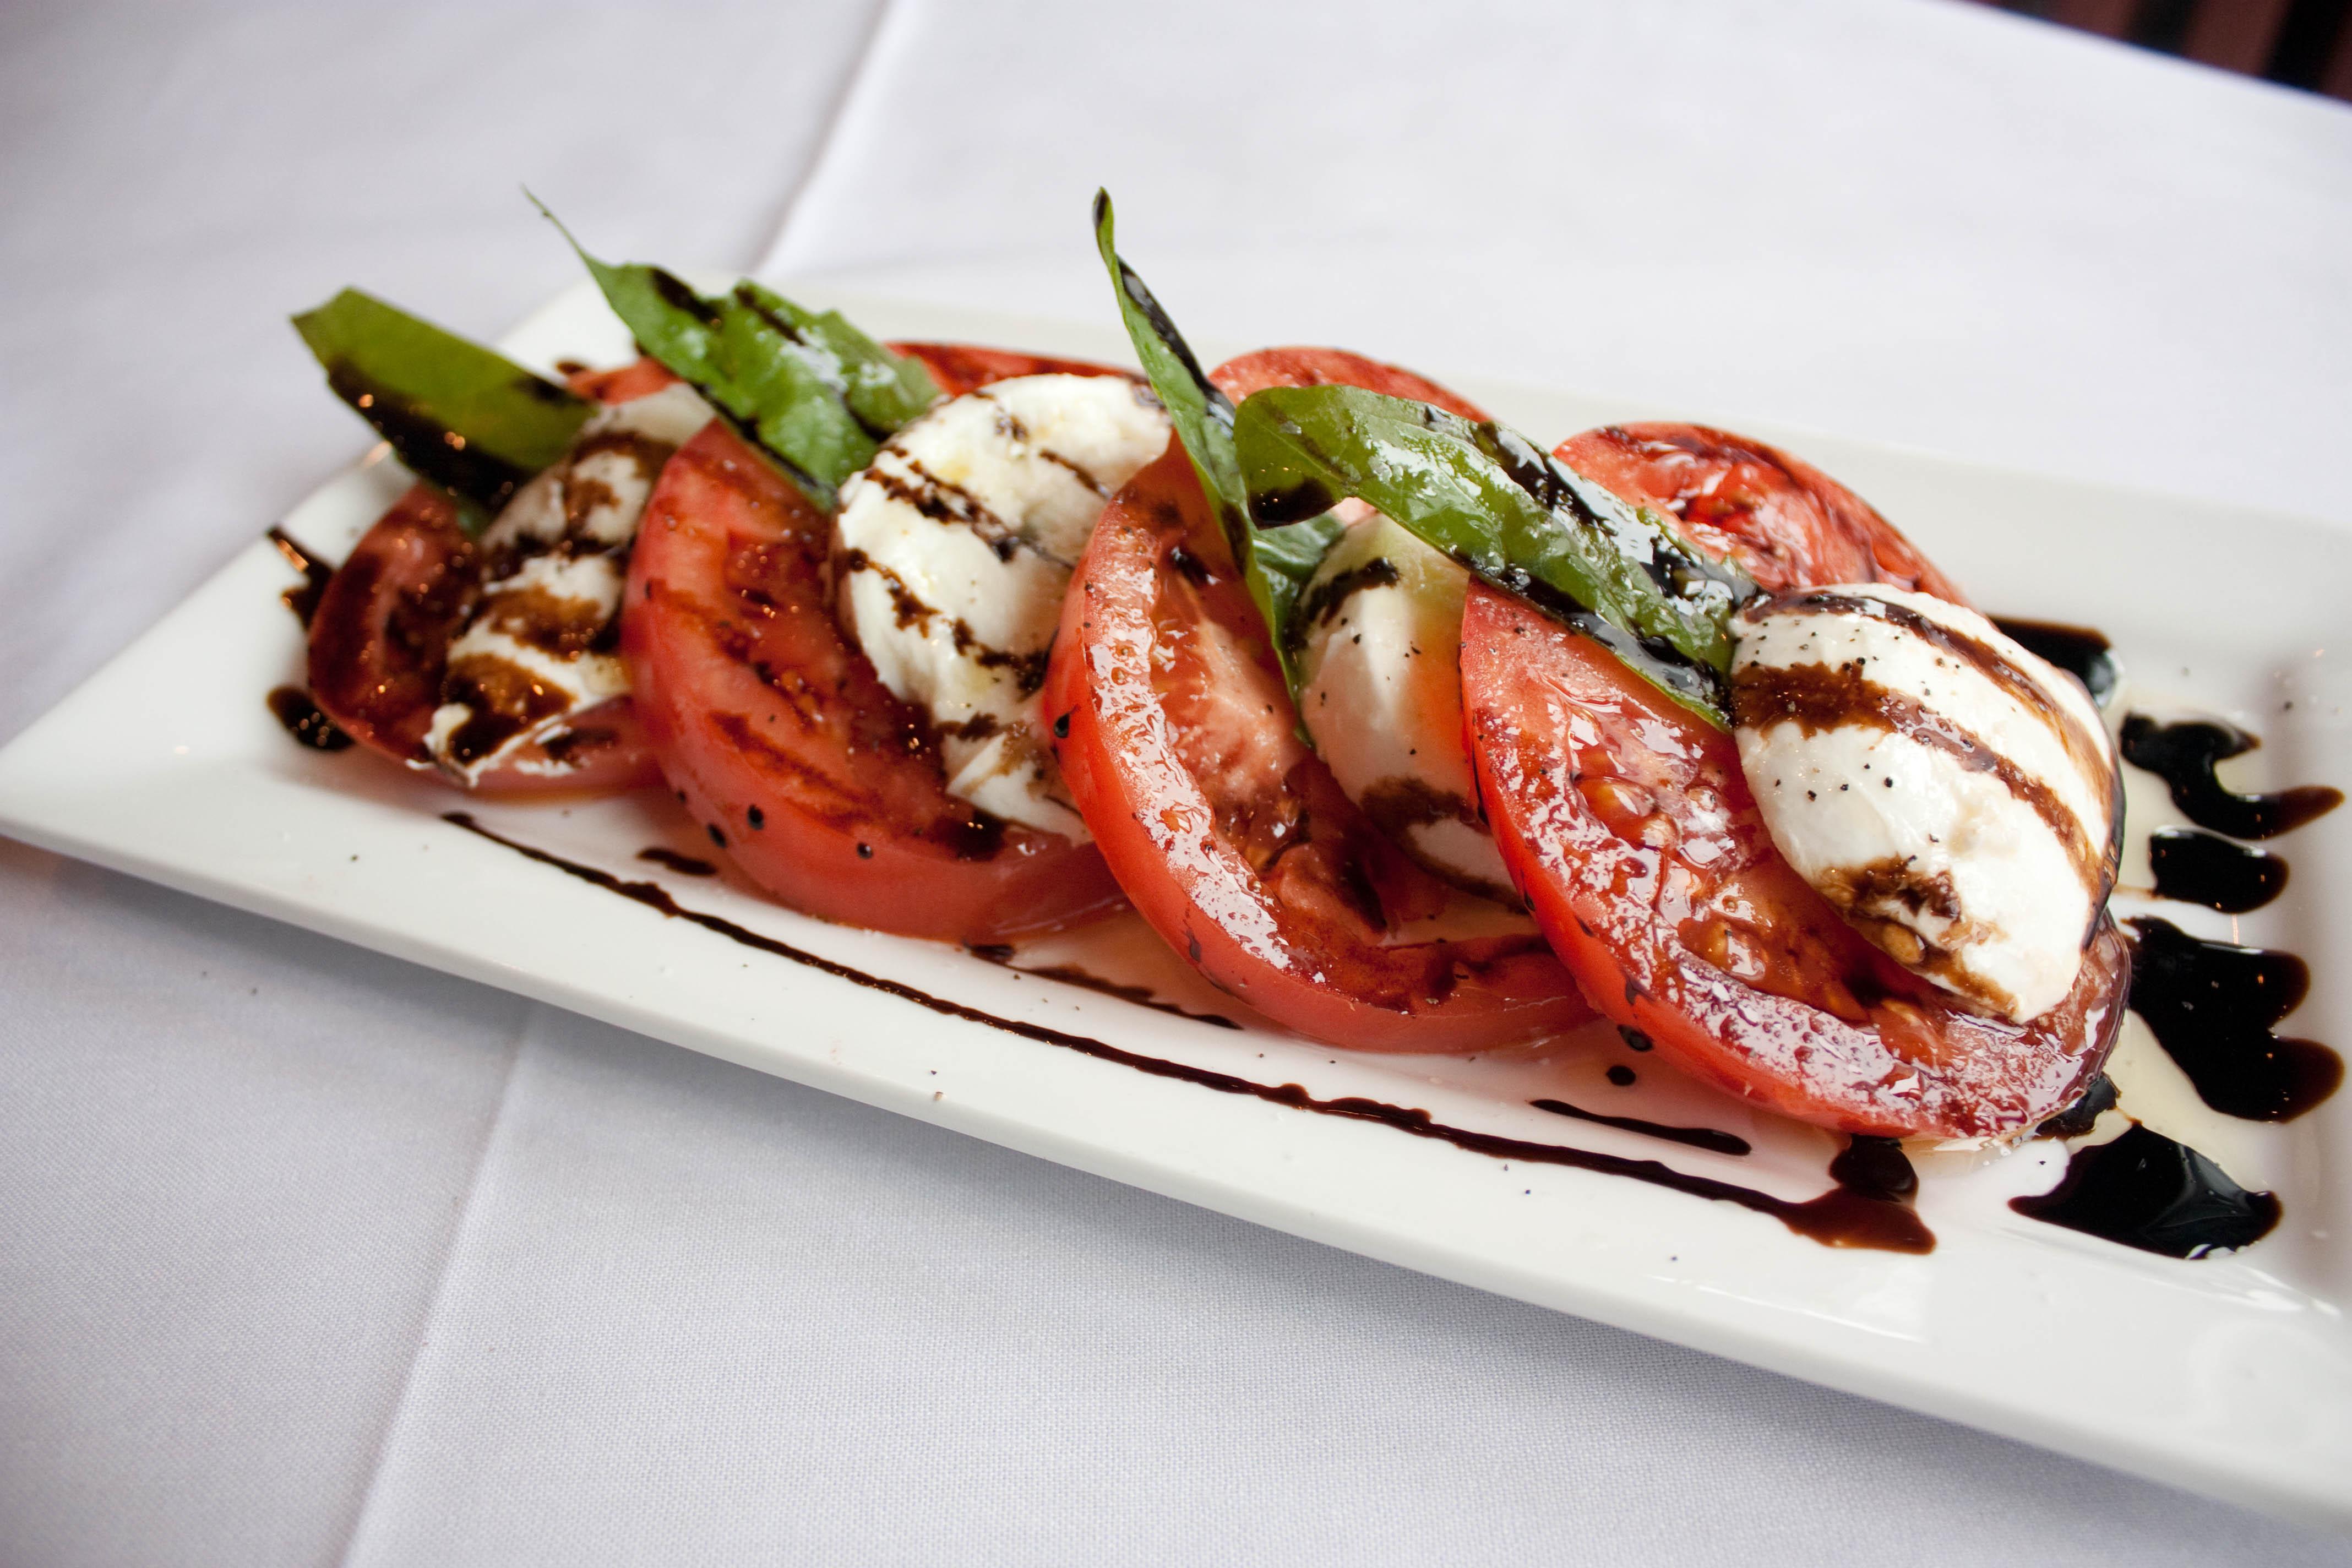 Dinner Food Delivery | Best Restaurants Near You | Grubhub